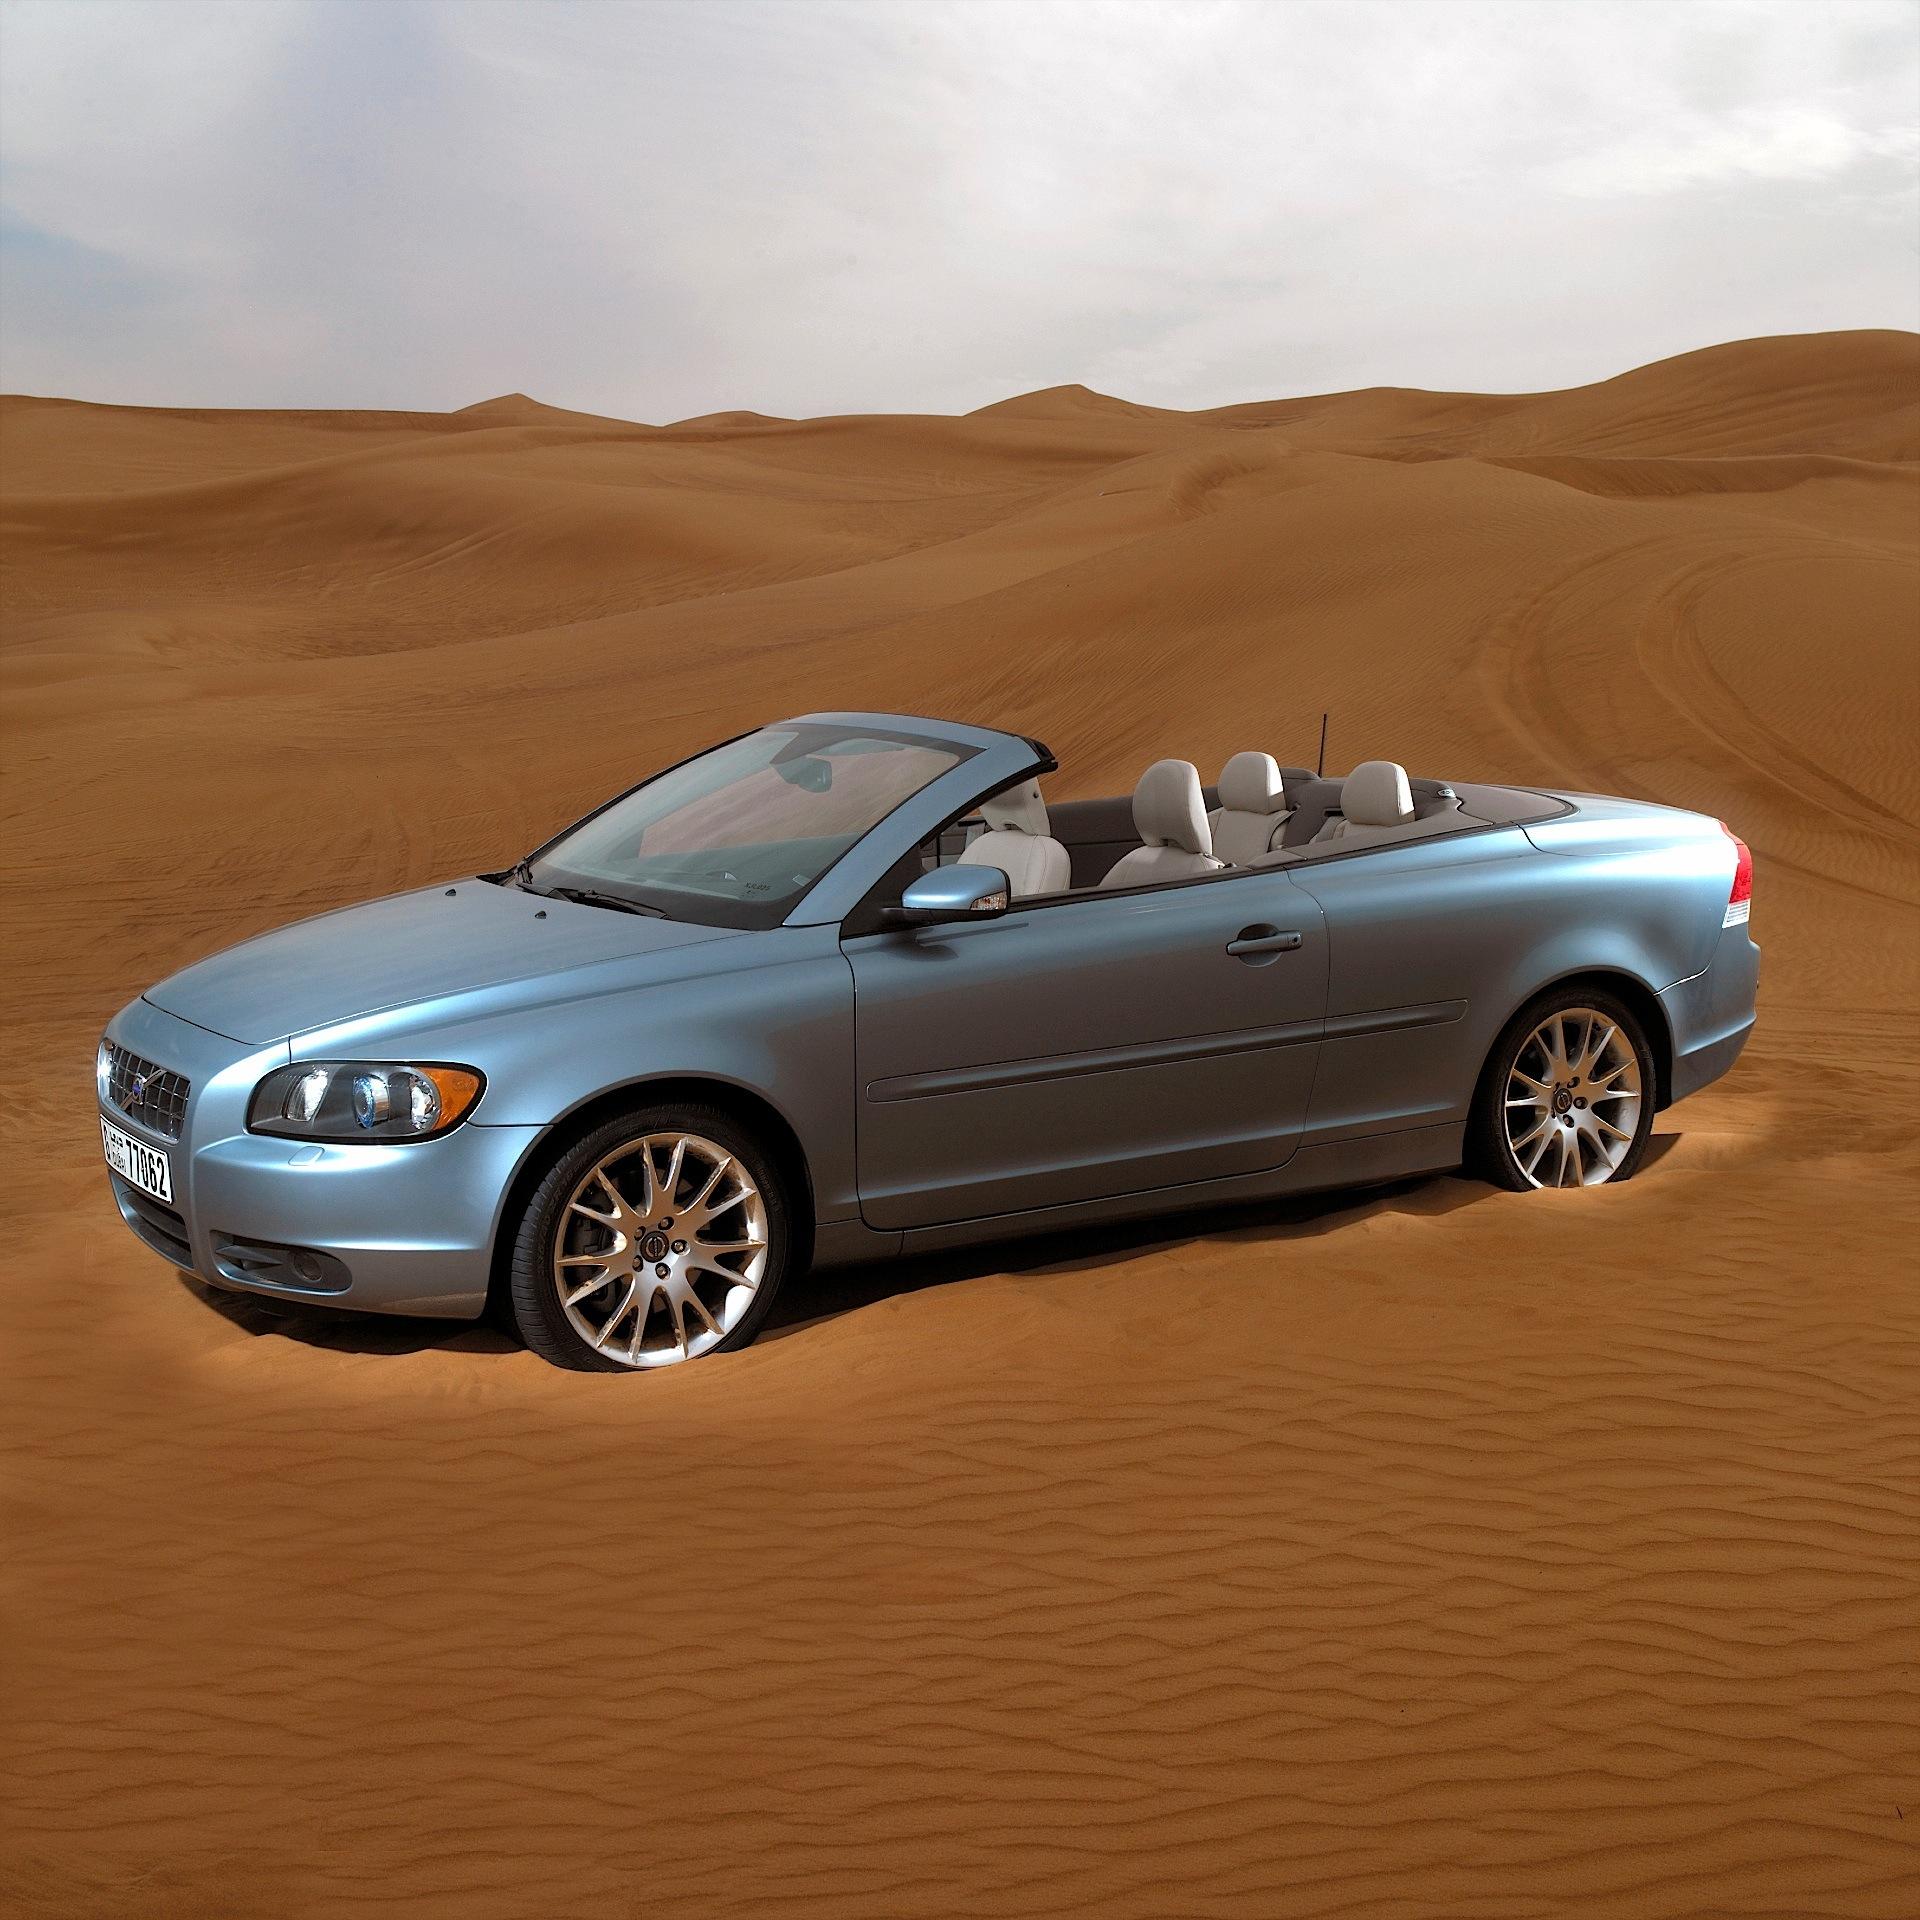 Used 2012 Volvo S60: 2005, 2006, 2007, 2008, 2009